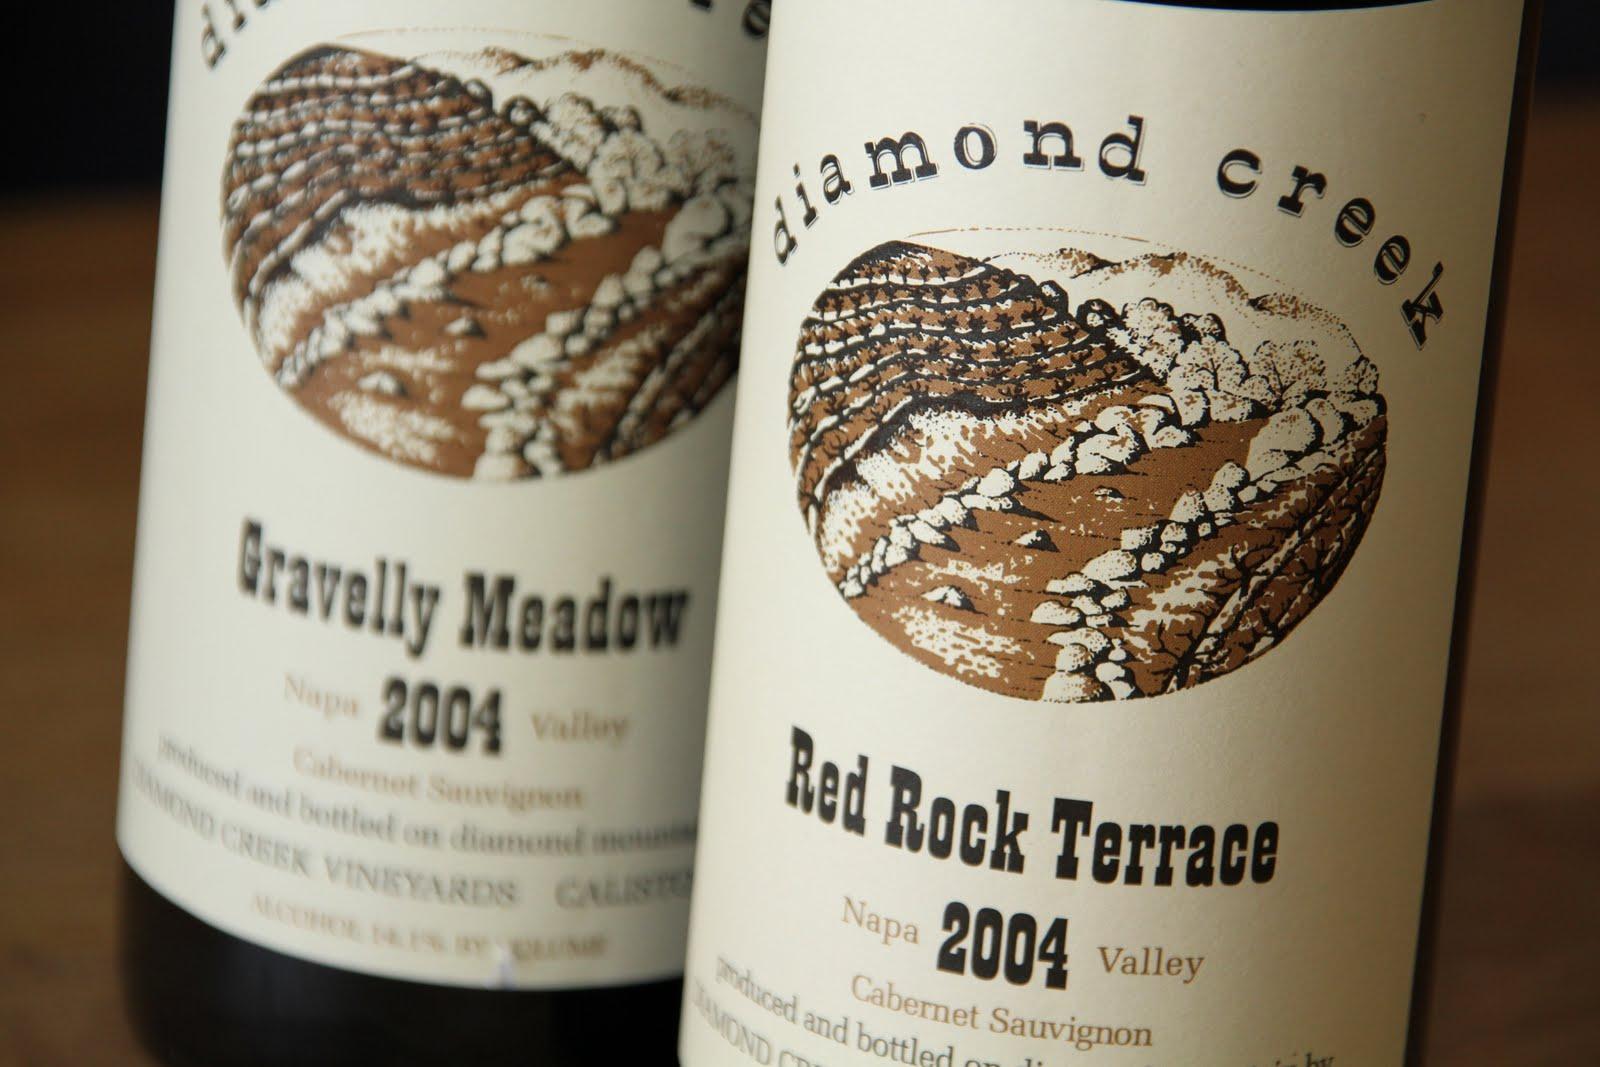 The wines of Diamond Creek